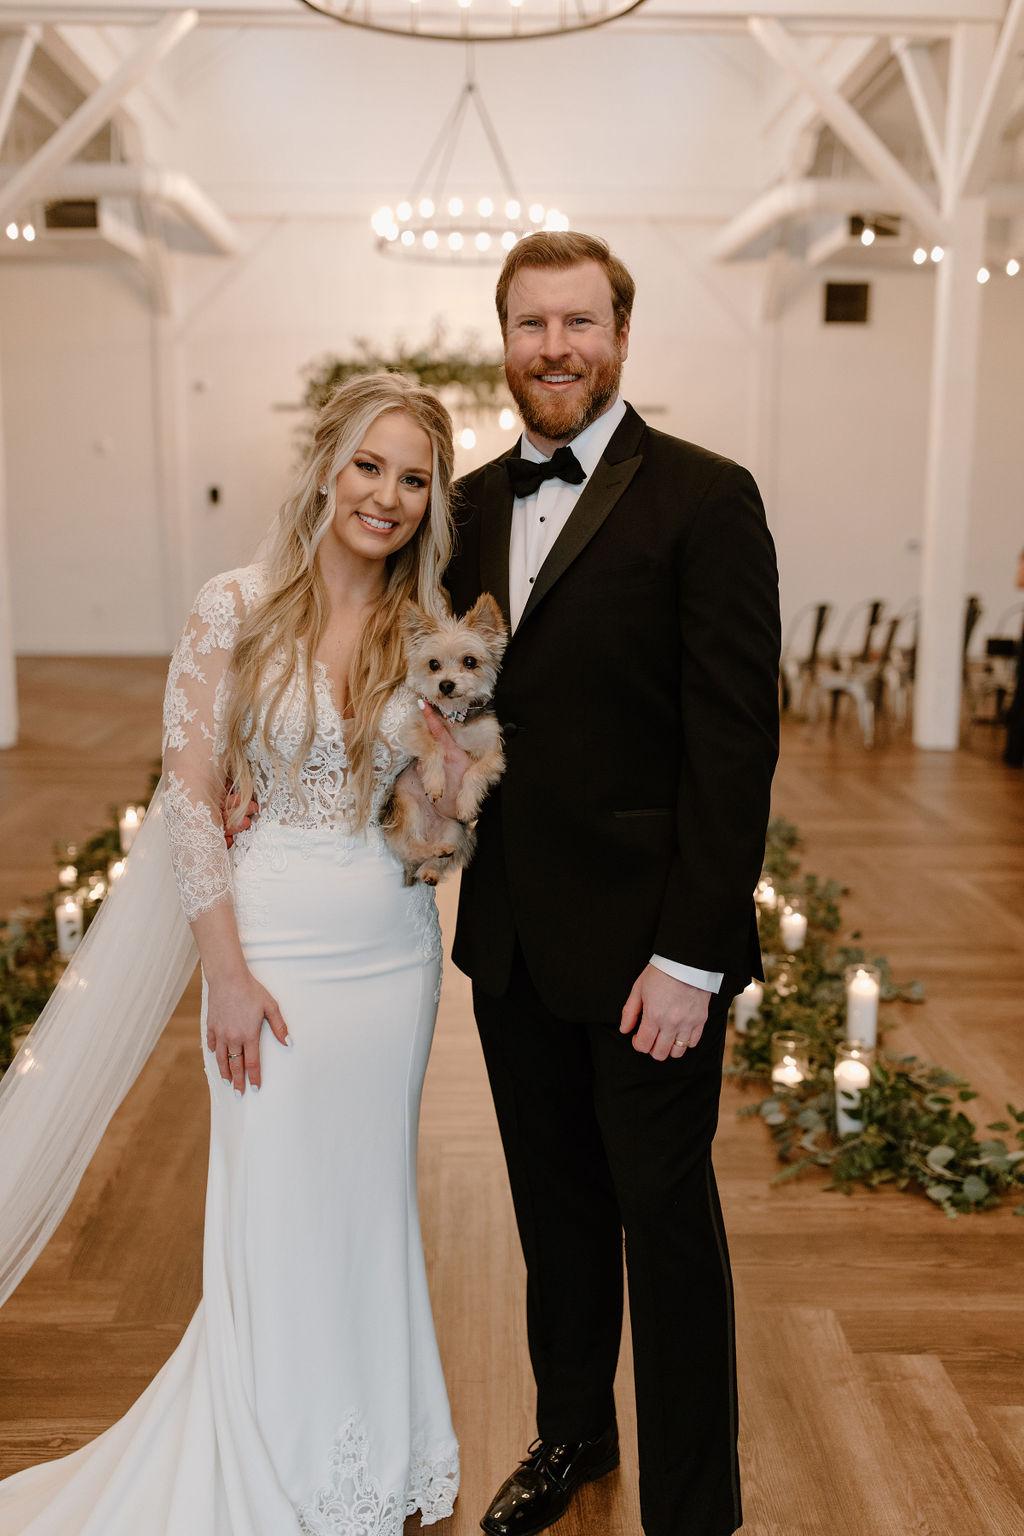 Dogs at Weddings | Nashville Bride Guide